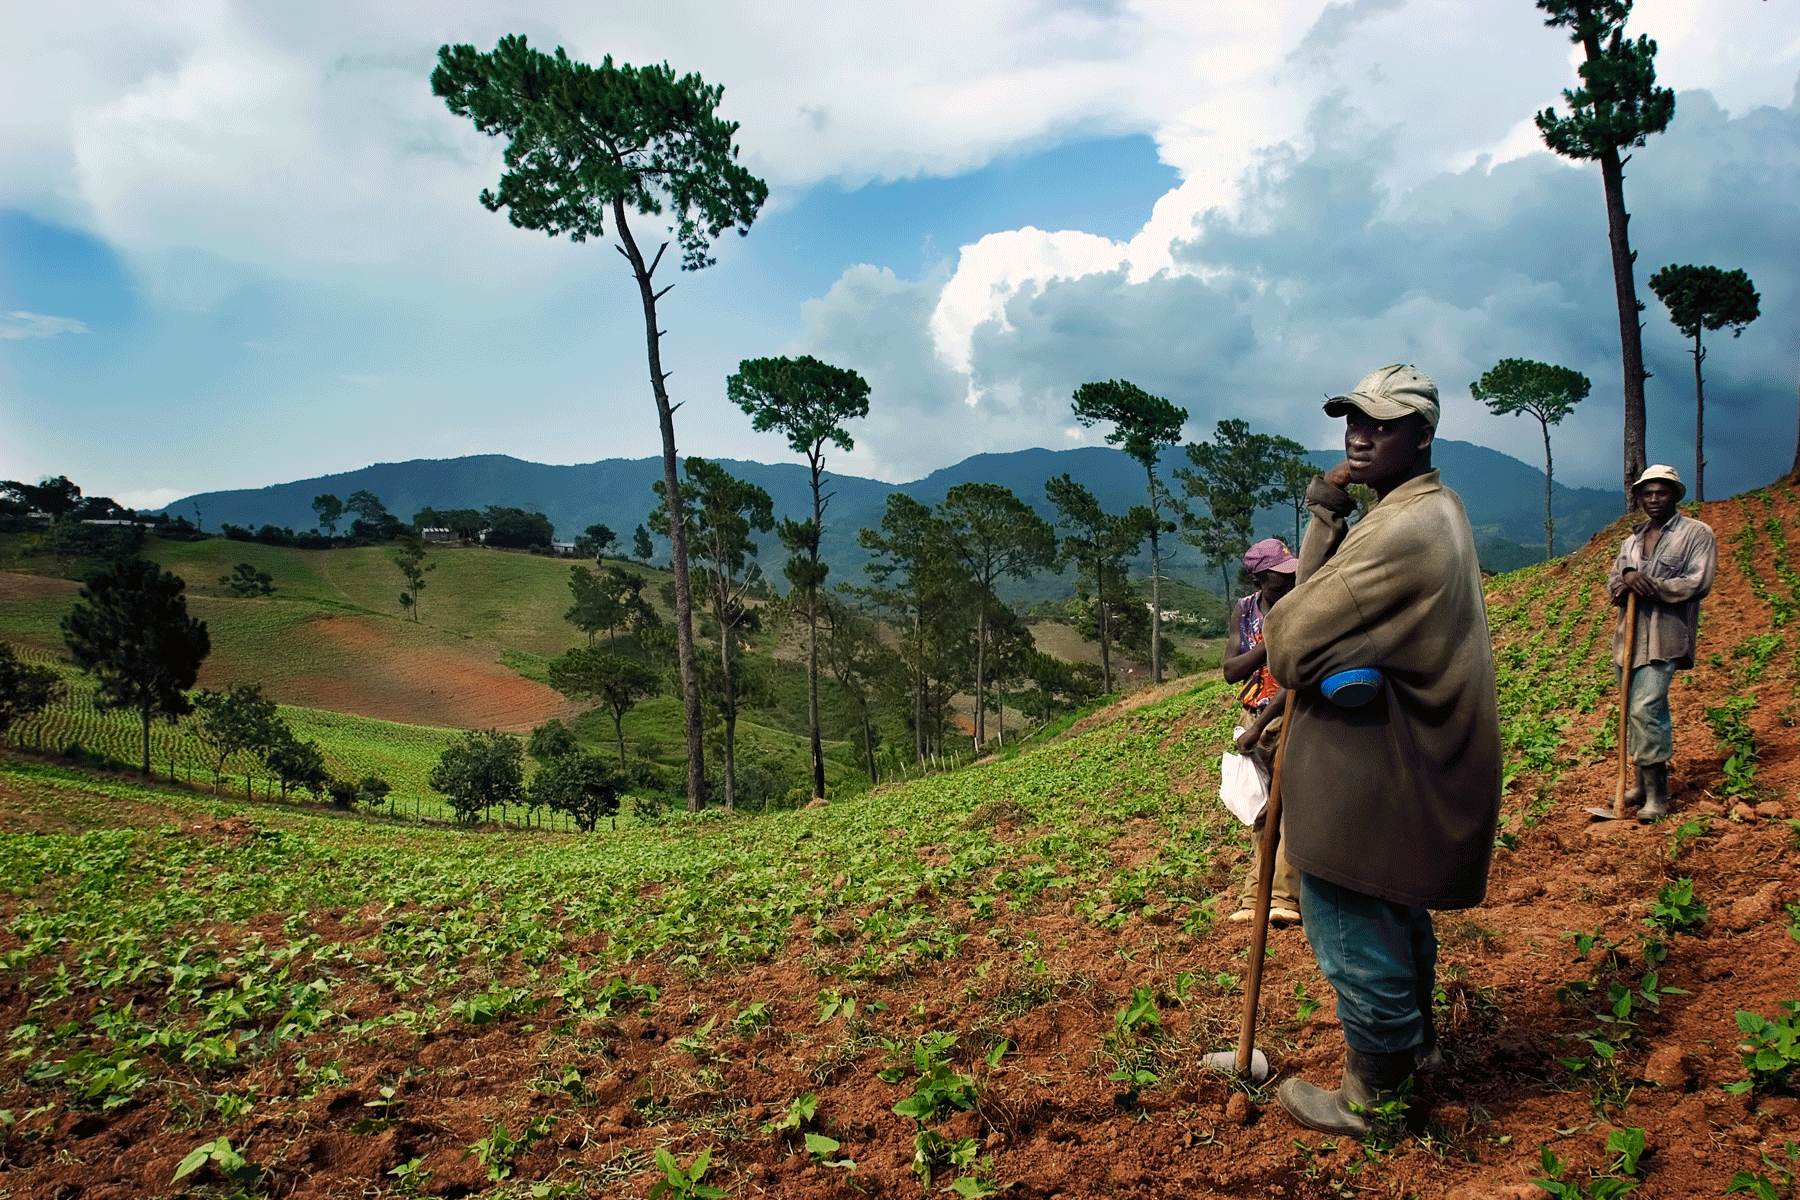 constanza-dominican-republic-farmland-mountianside